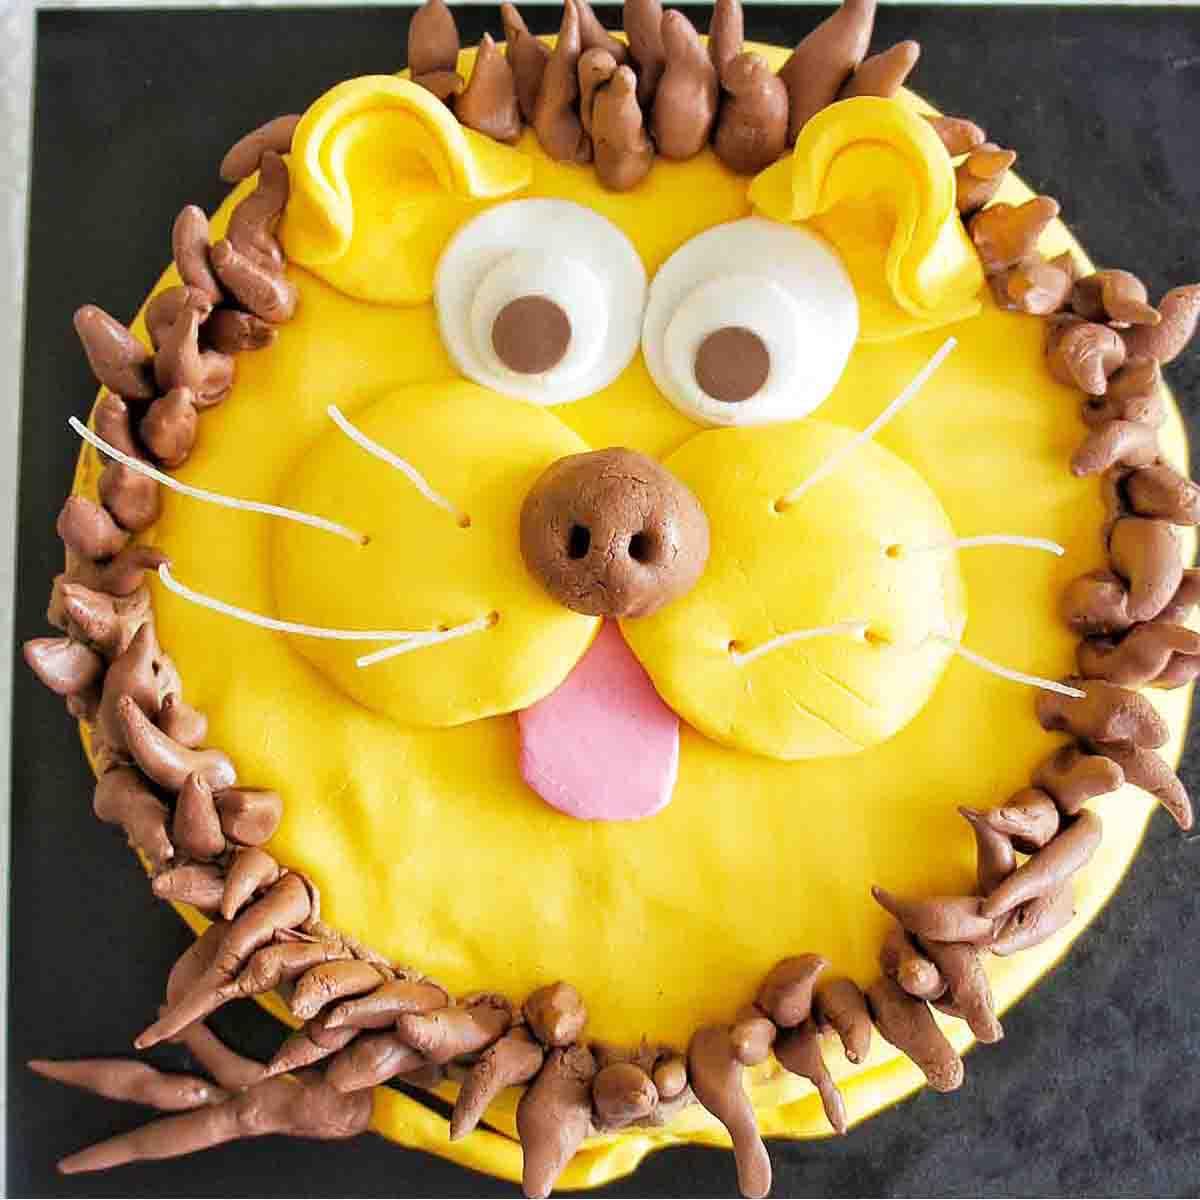 Lion Cake on a black cake board